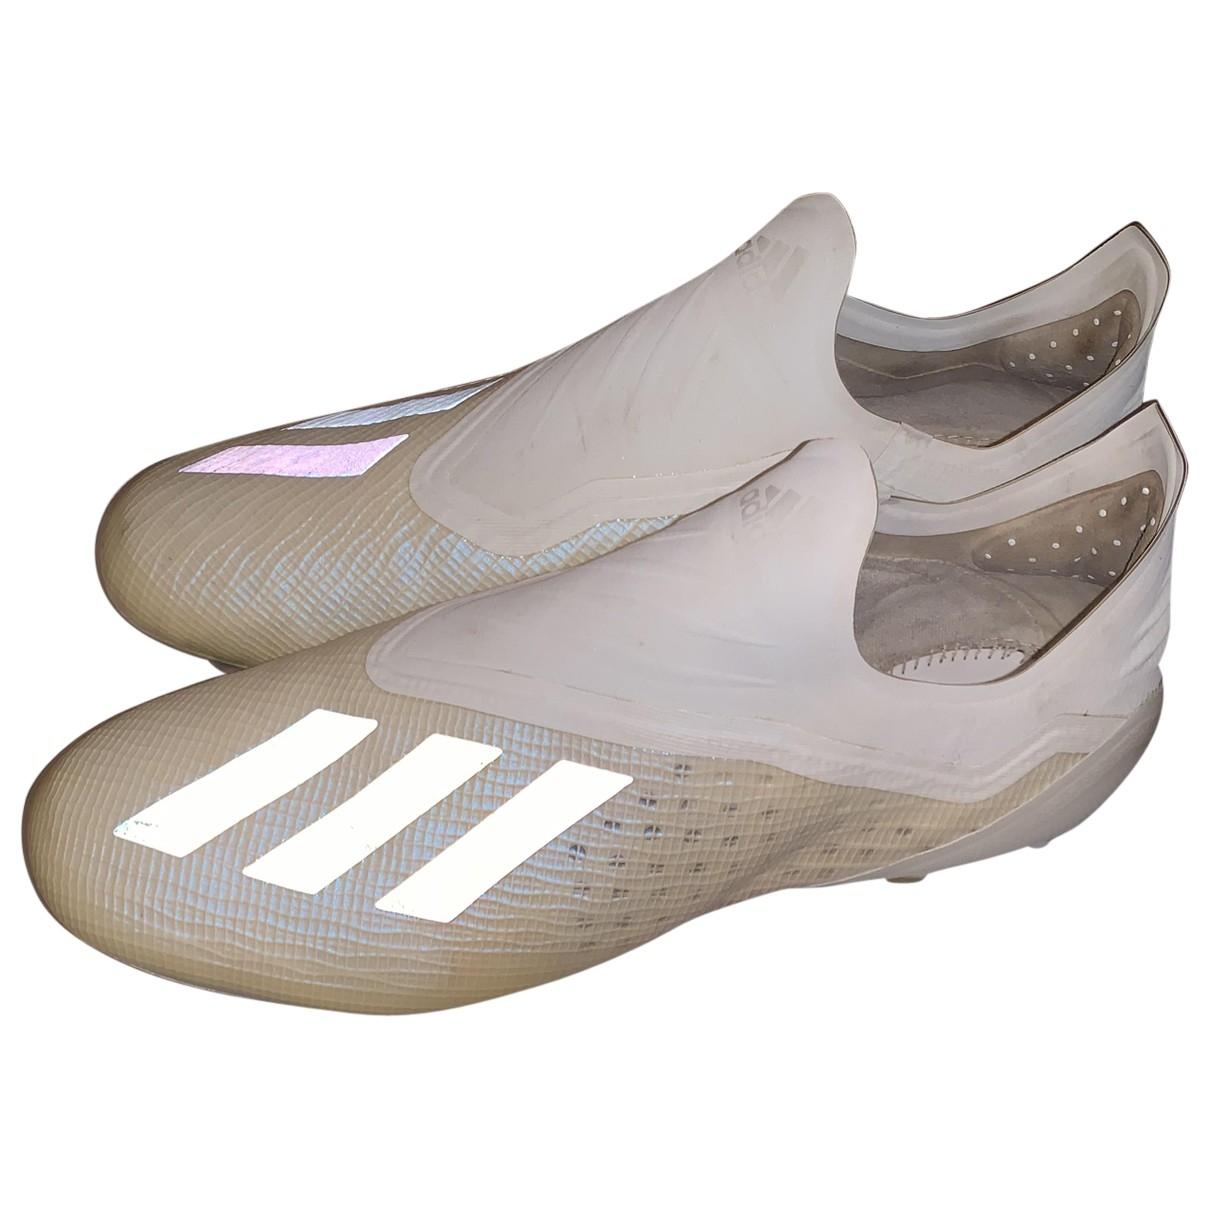 Adidas \N Sneakers in  Weiss Kautschuk